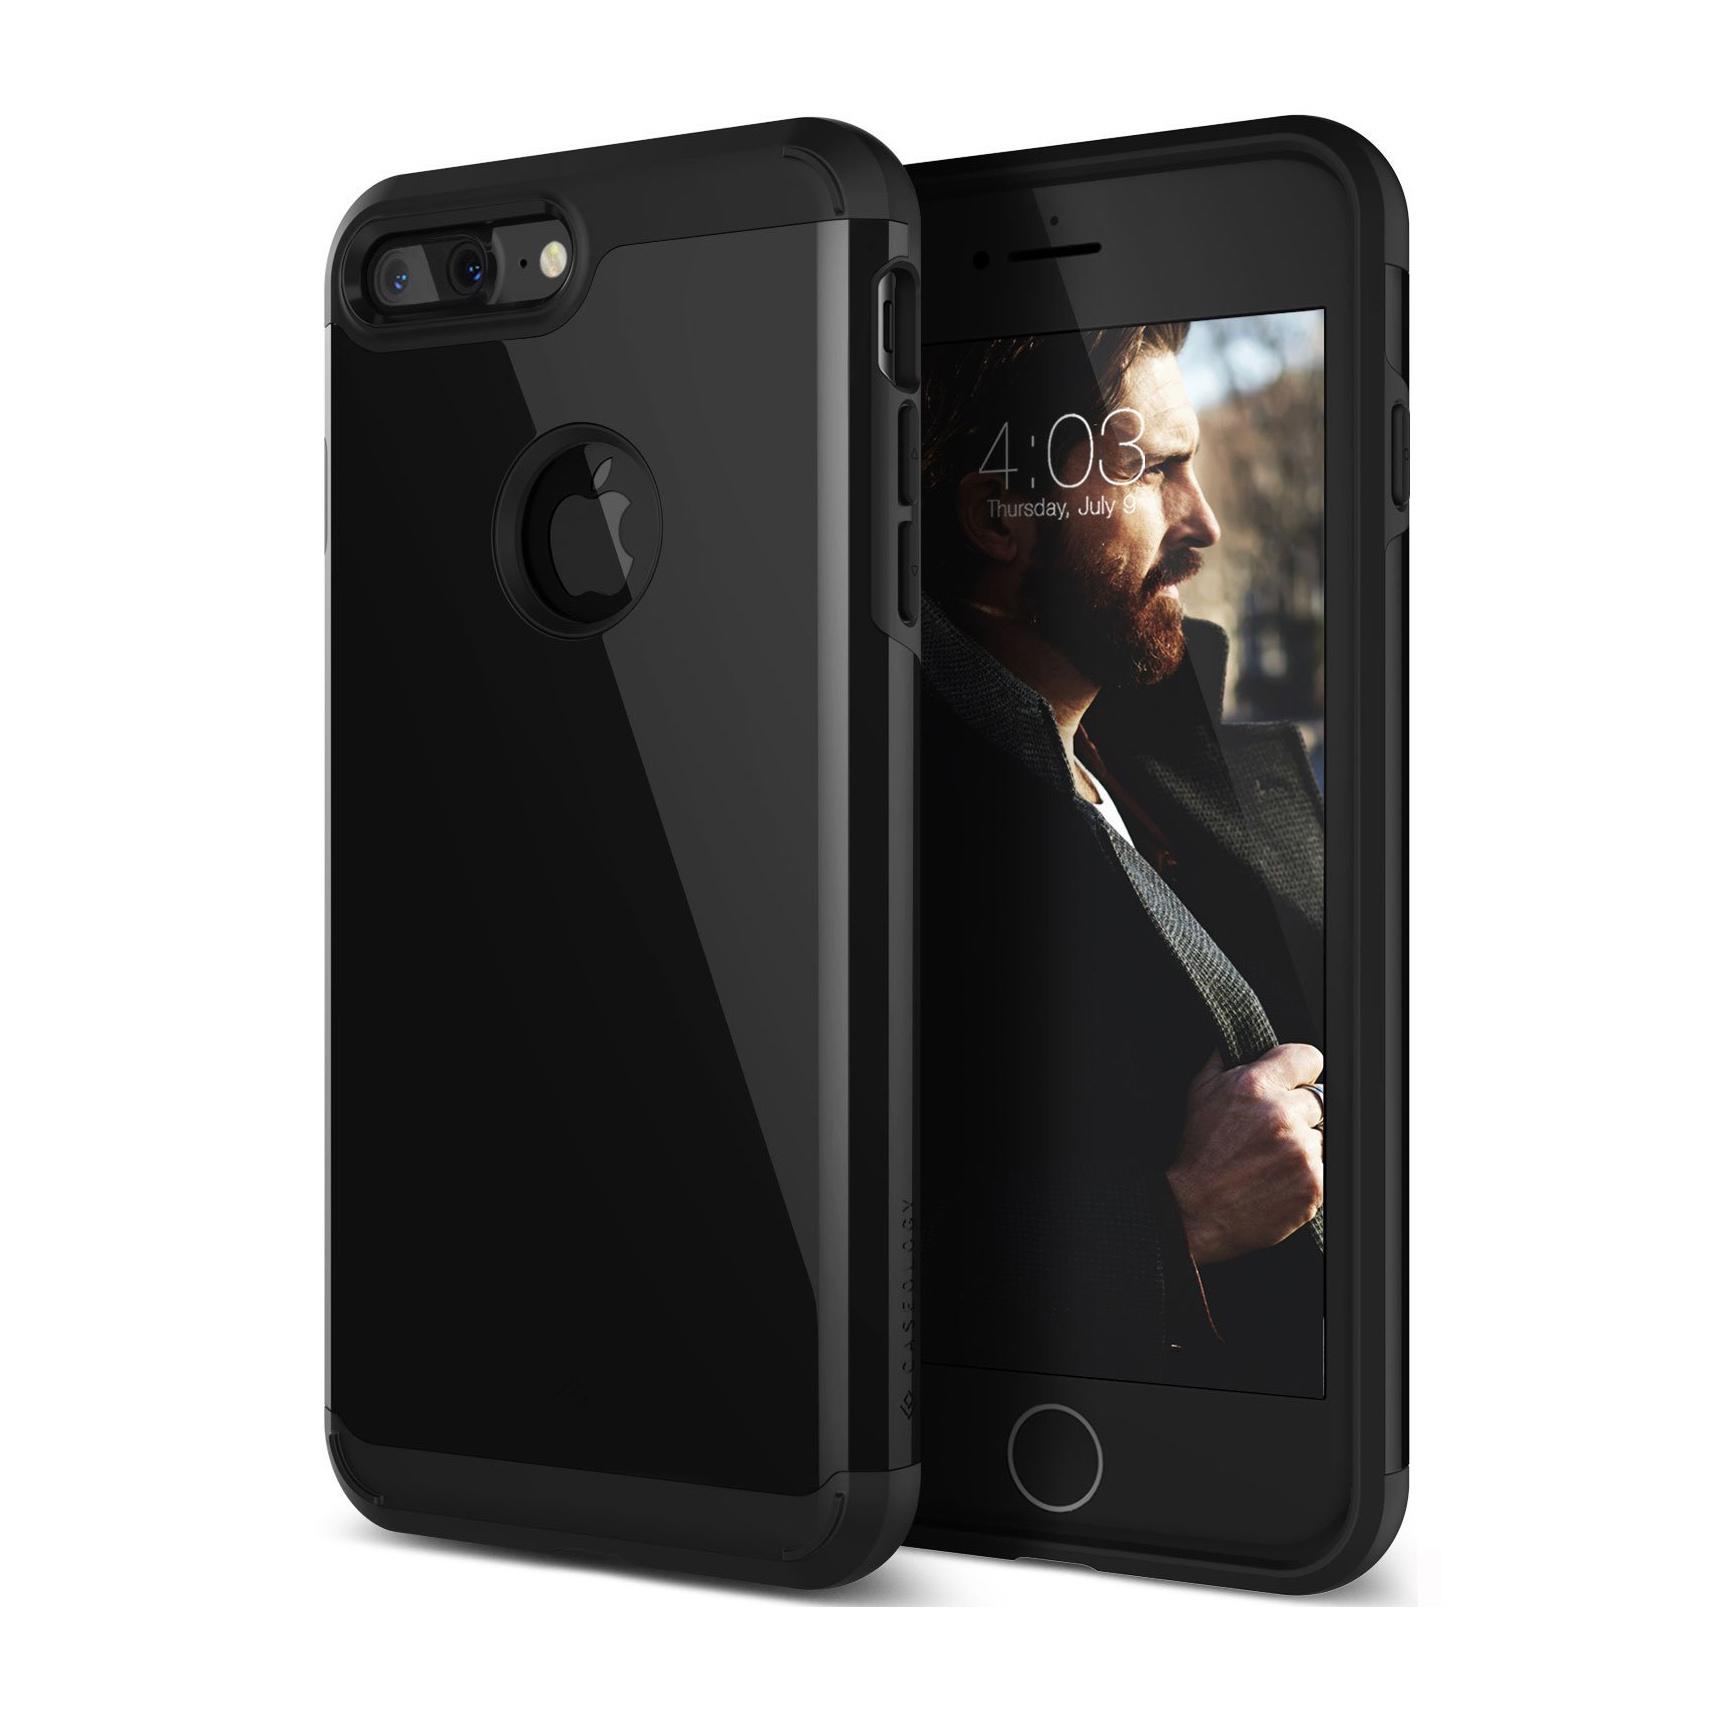 360 Degree Full Protection Defense Shield [Elite Armor] Case for iPhone 7plus